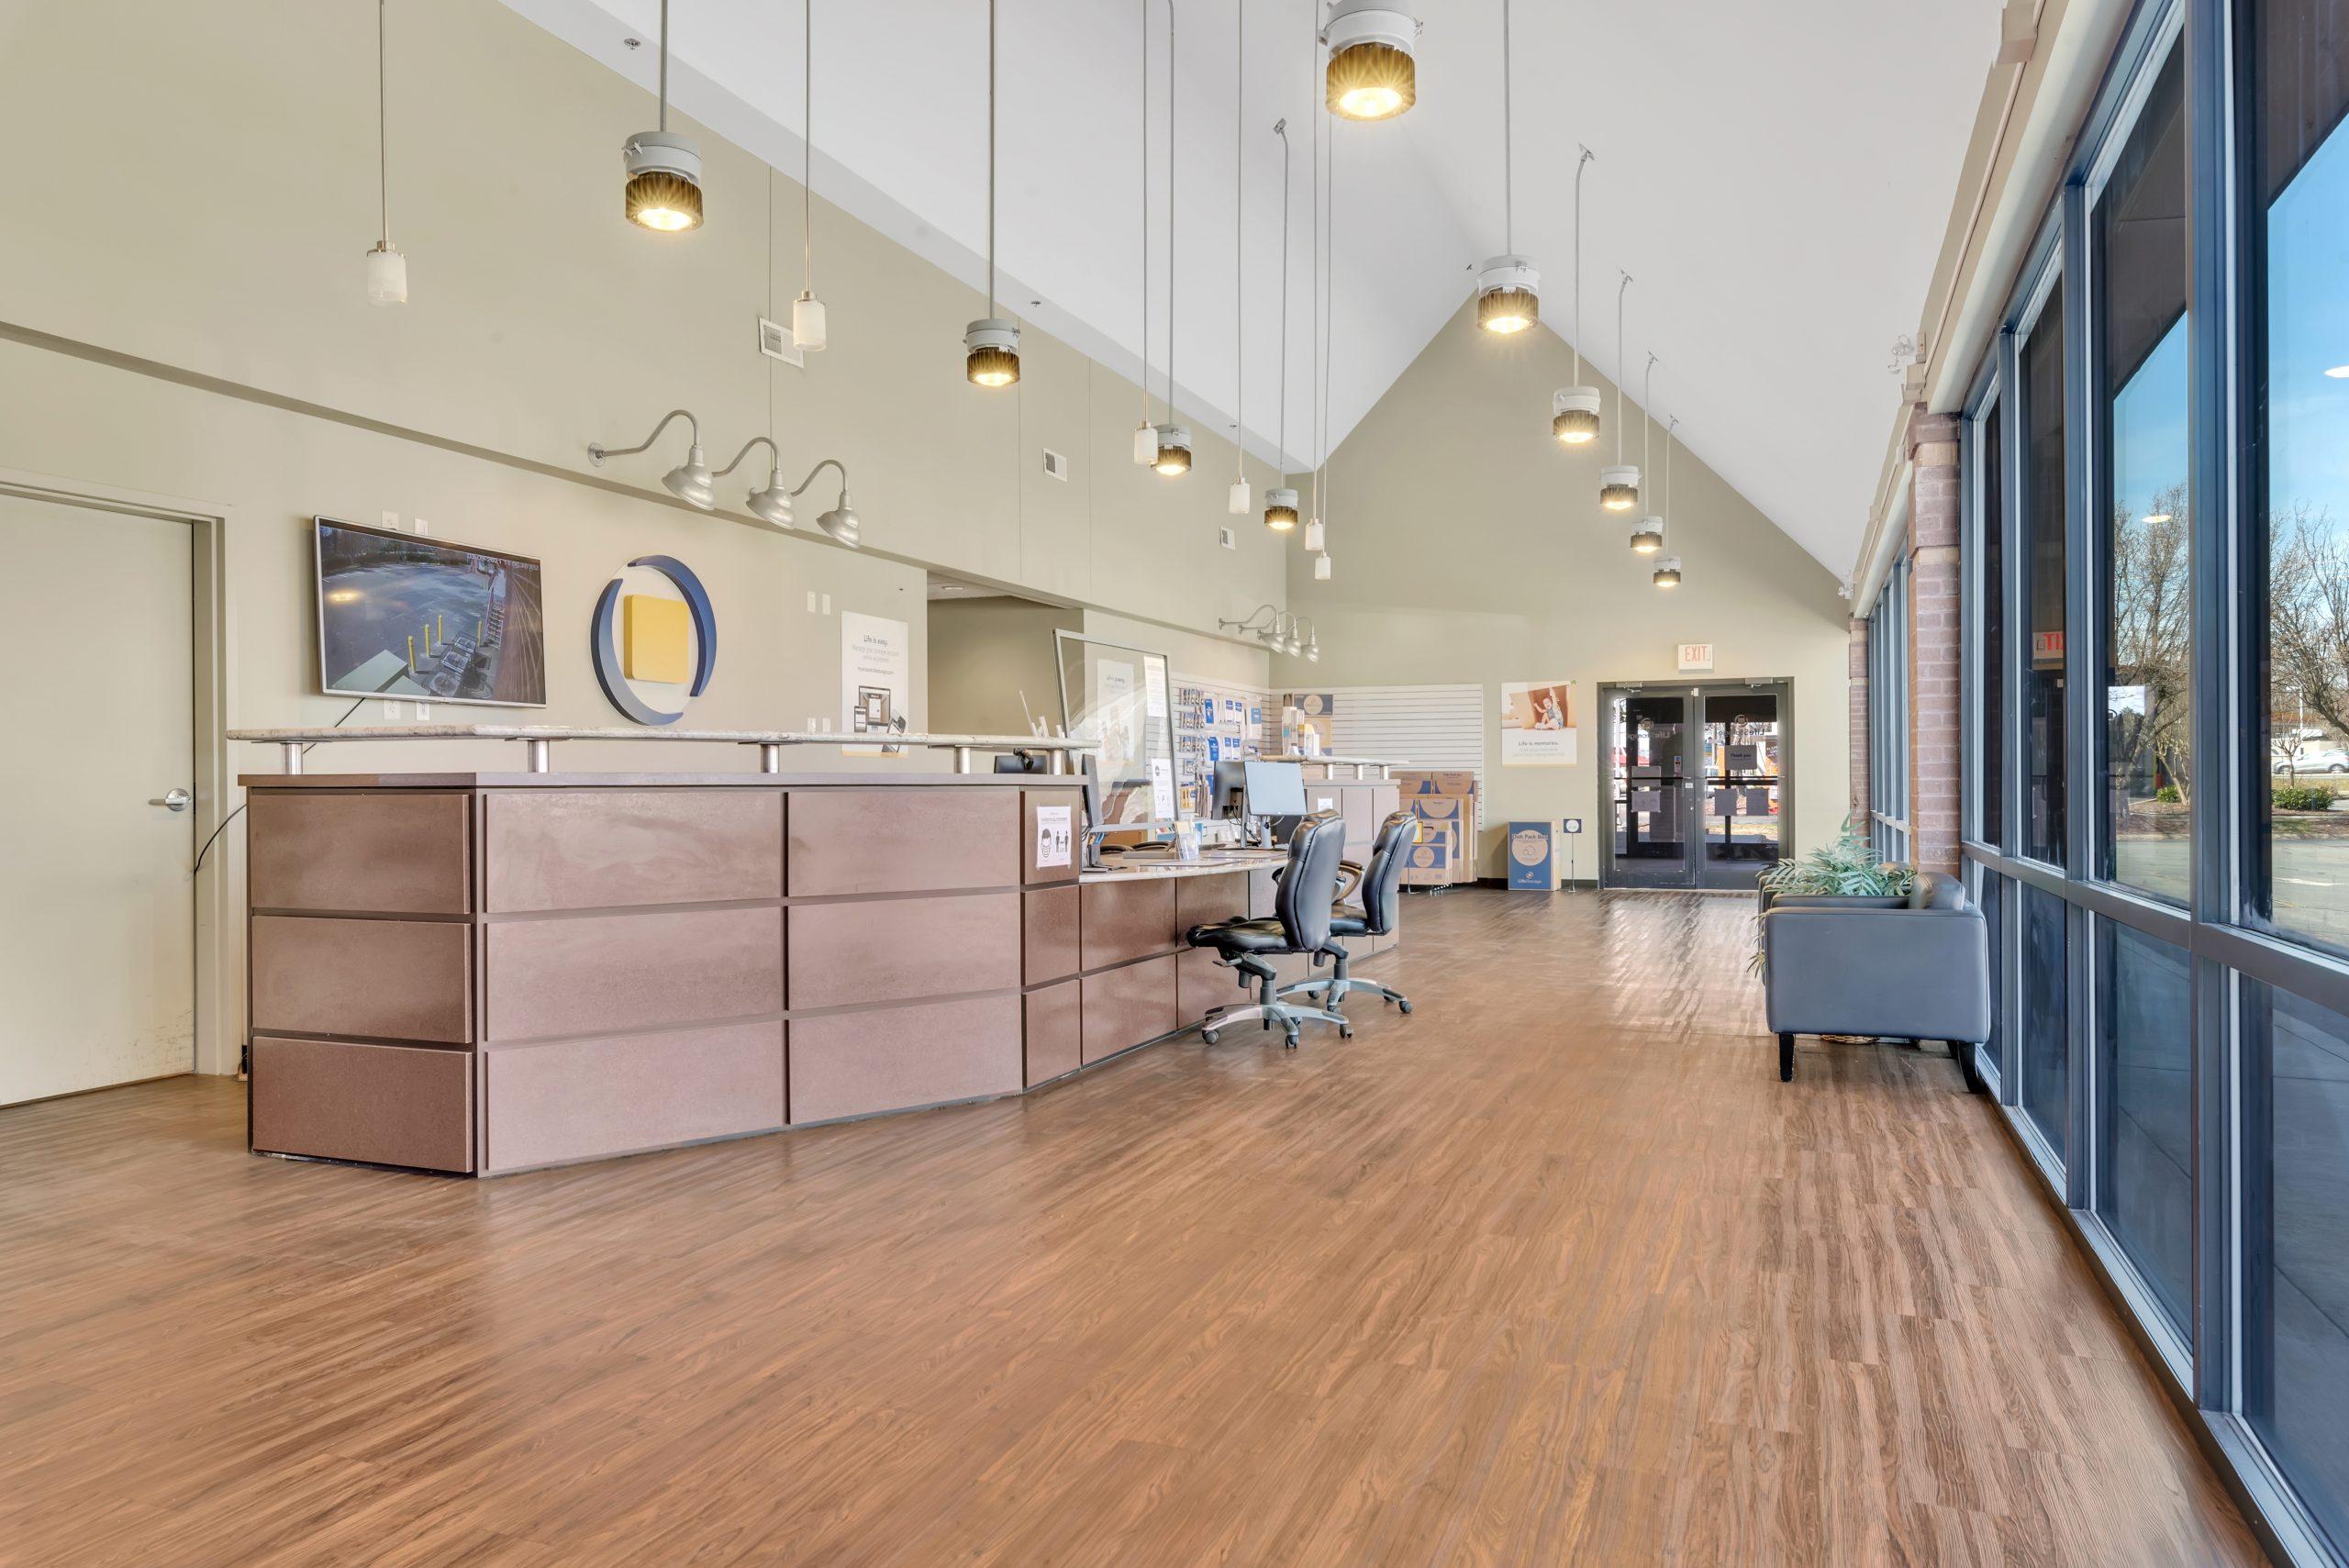 Life Storage  -  Winston-Salem, NC